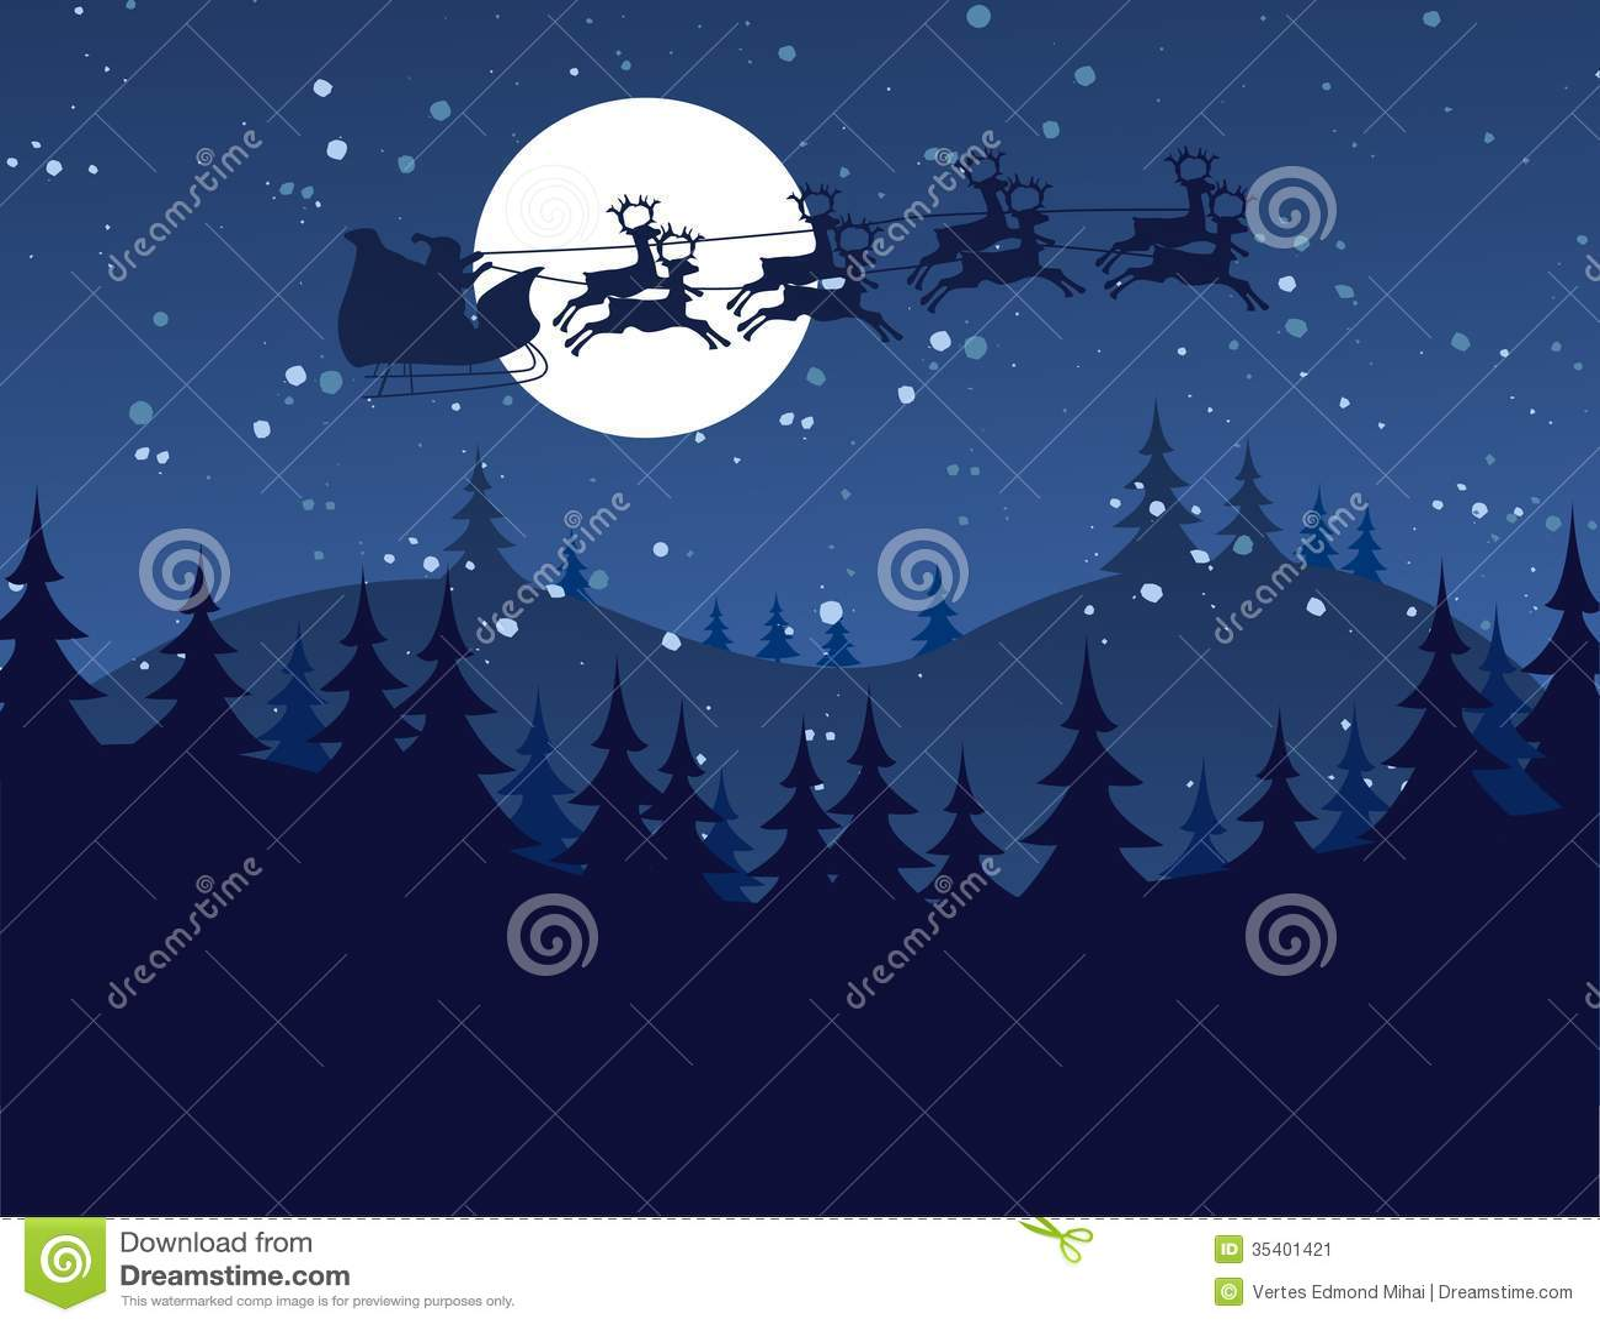 Flying Santa And Christmas Reindeer Stock Image - Image ...